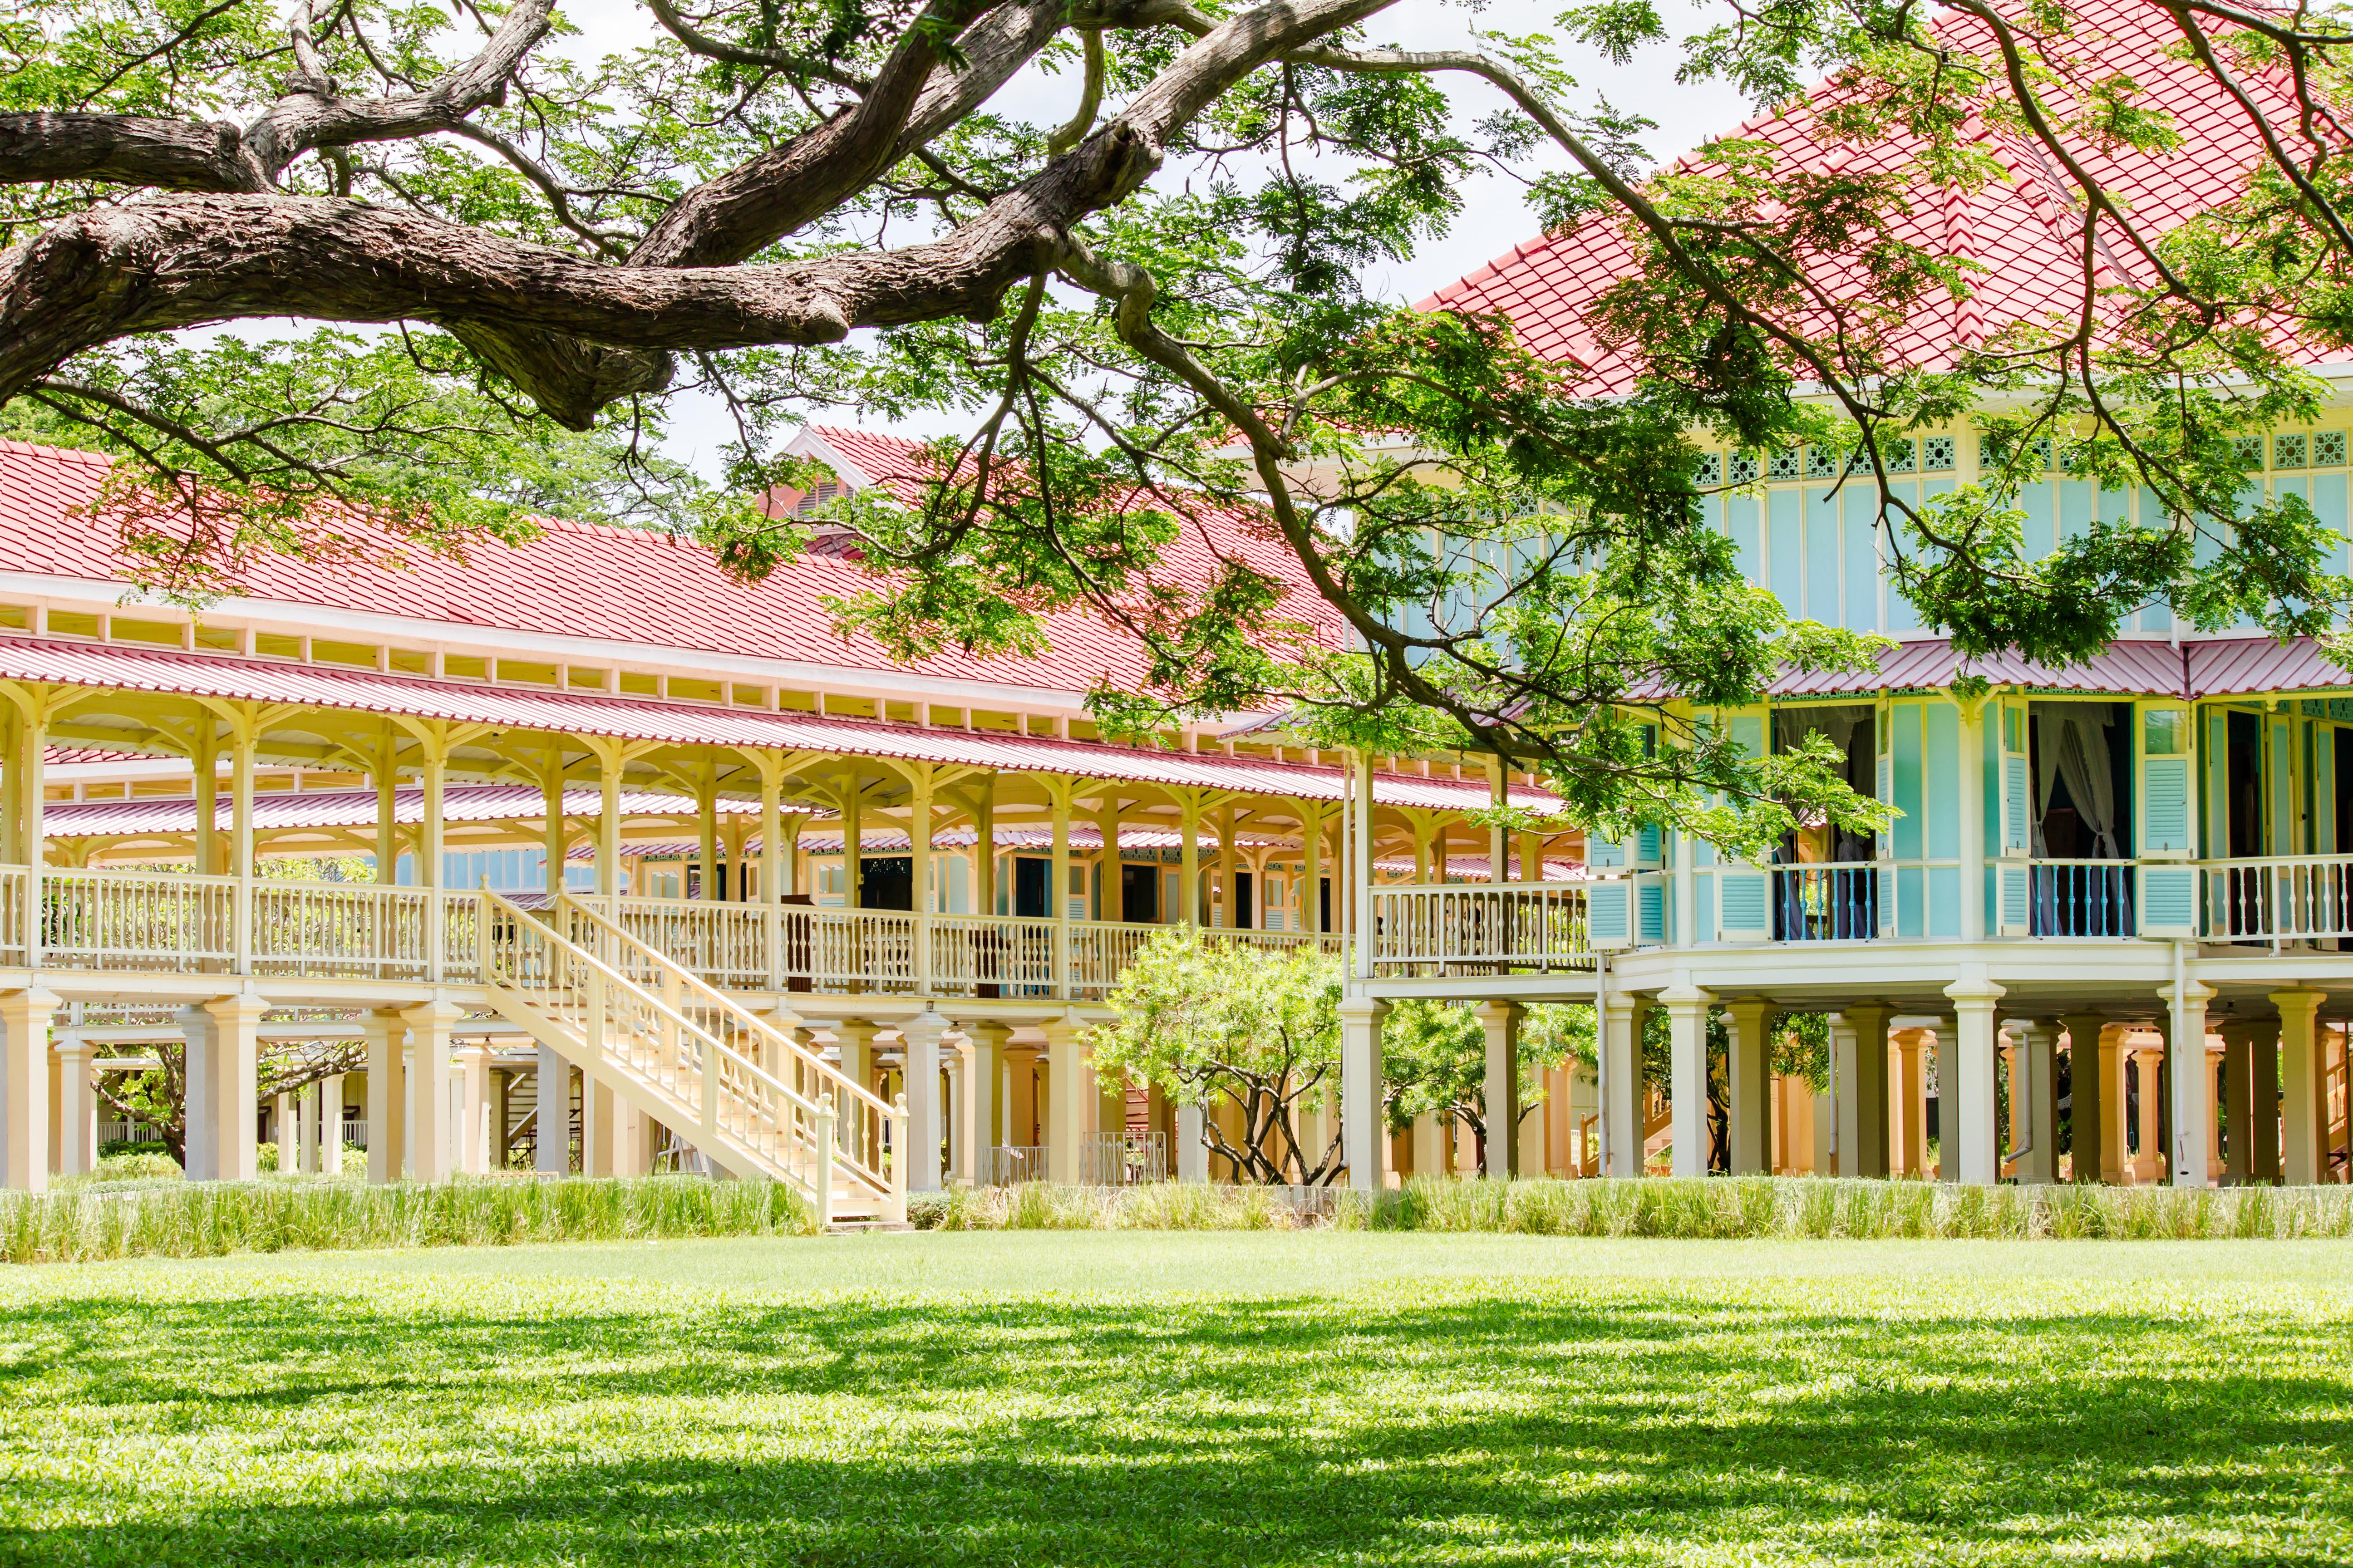 Королевский дворец Марукхатайаван